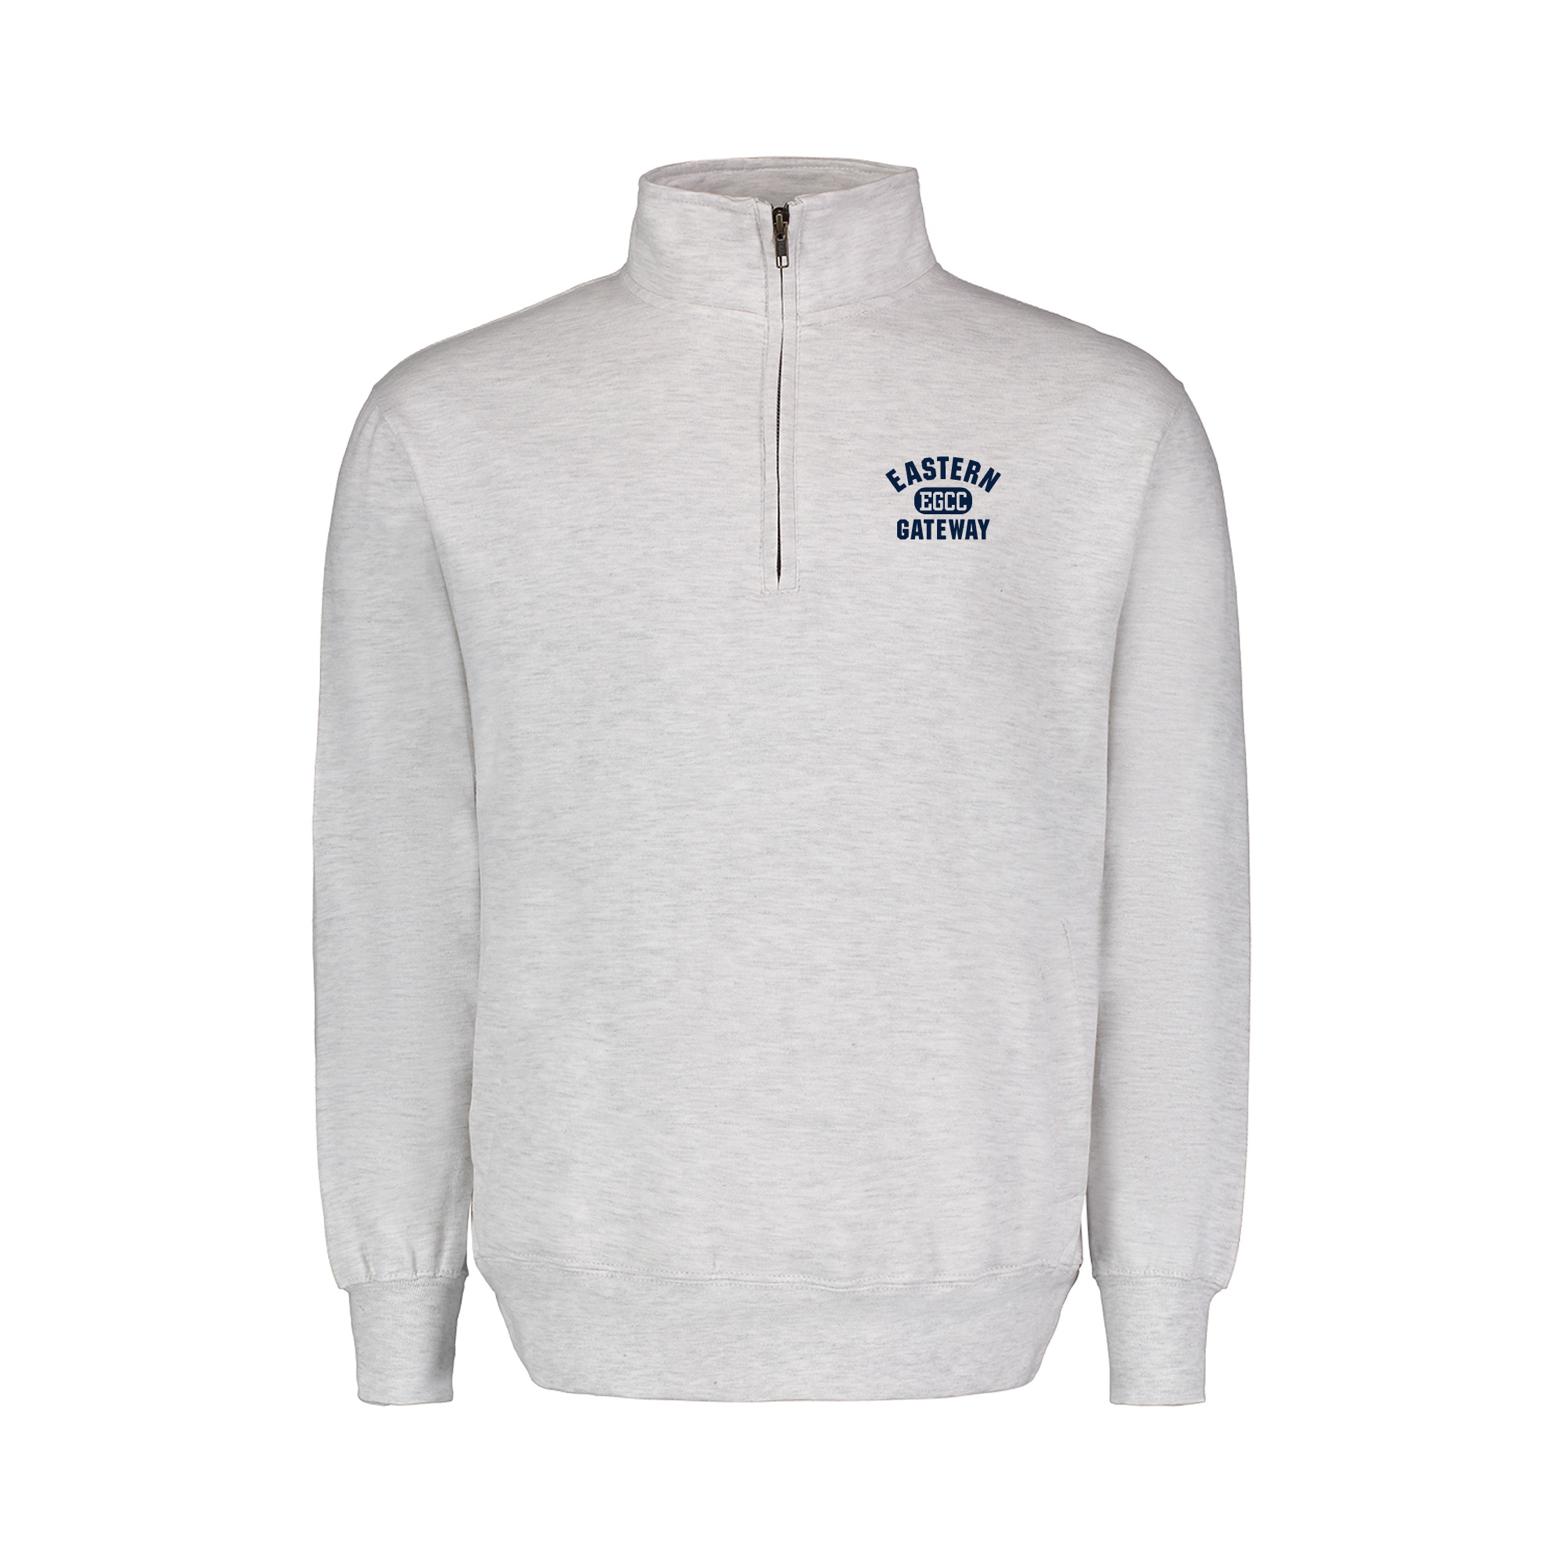 Image for the Quarter Zip Sweatshirt Gray Eastern Gateway EGCC product